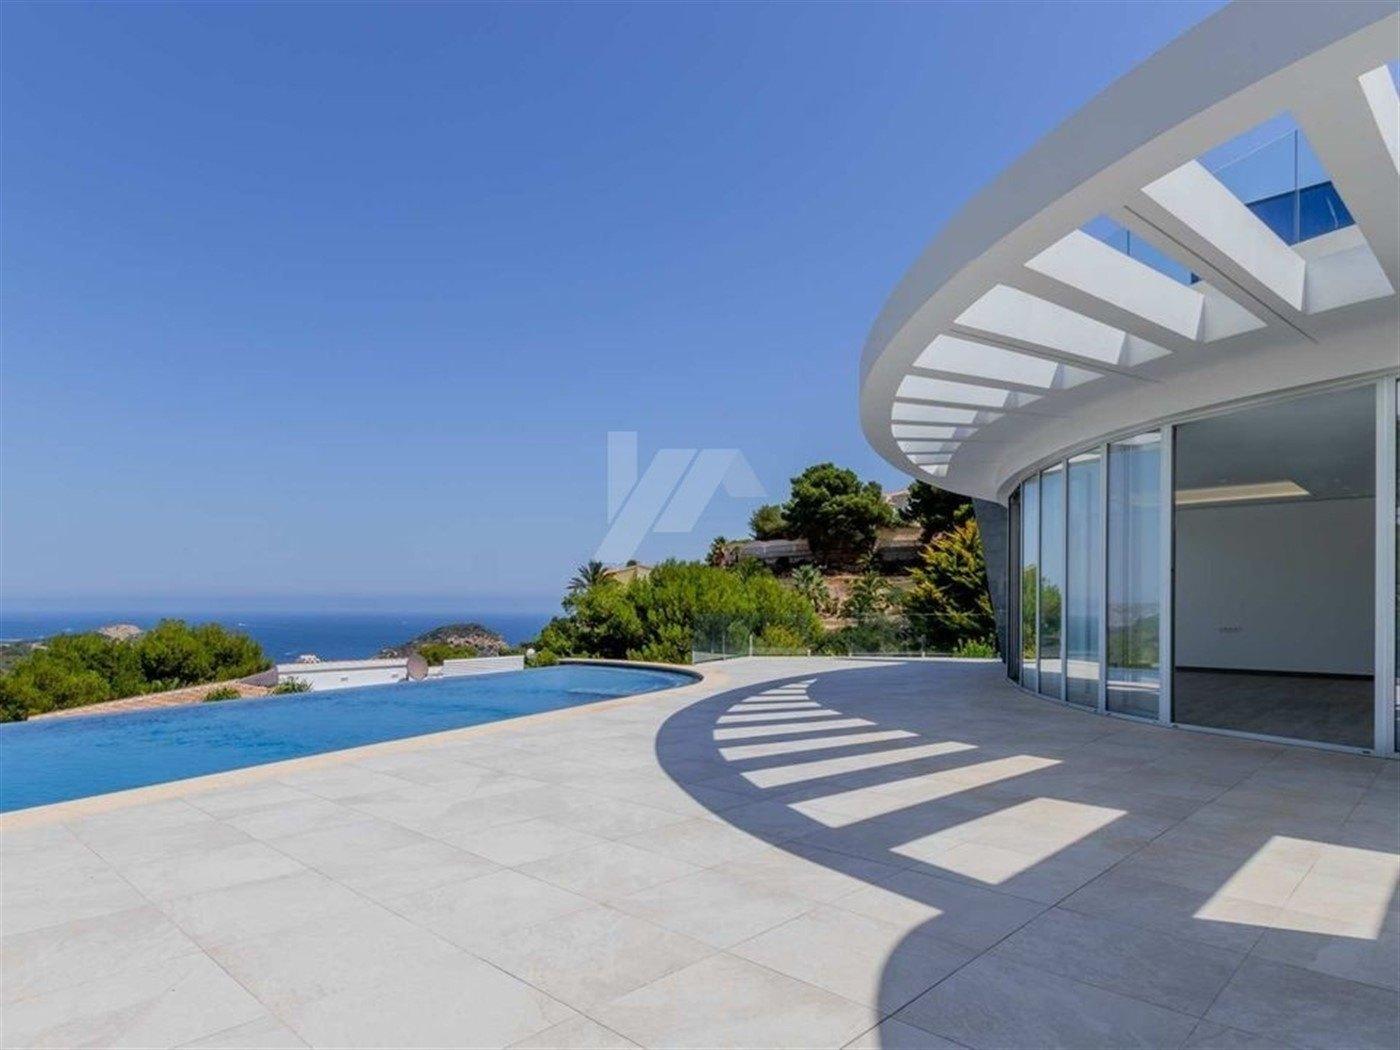 Meerblick Neubau Villa zum Verkauf in Javea, Costa Blanca.